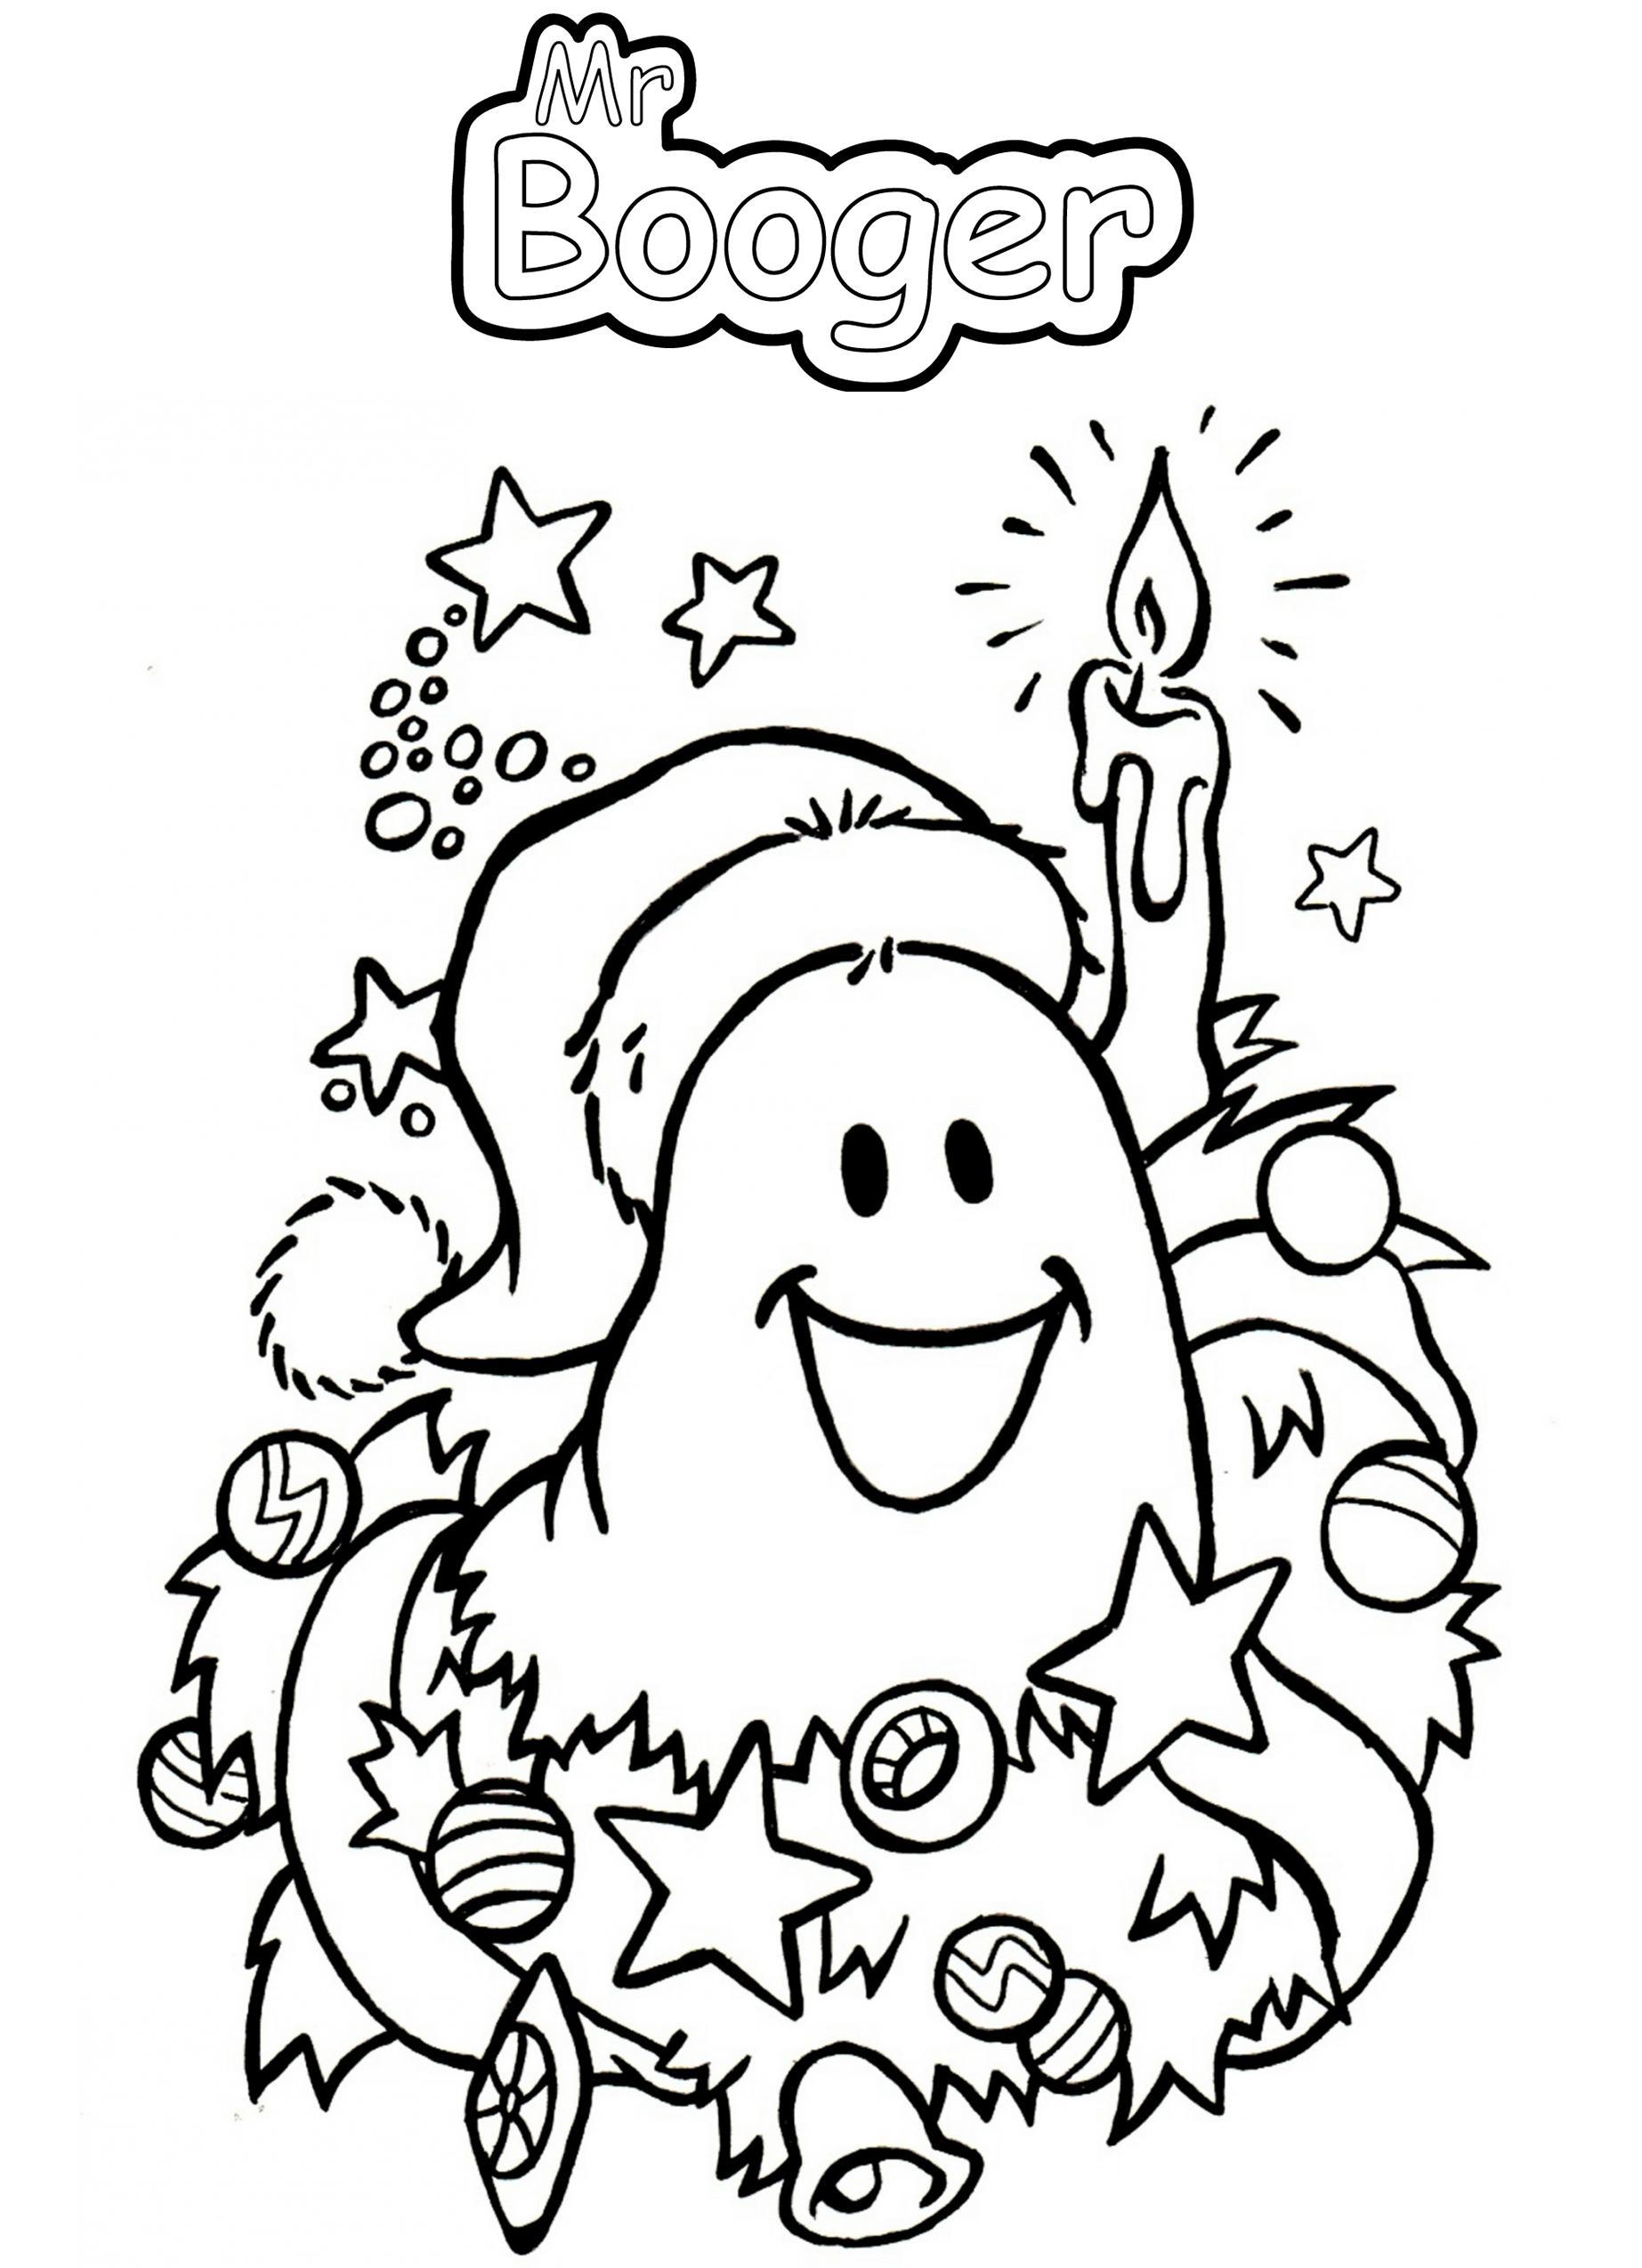 Christmas Mr Booger